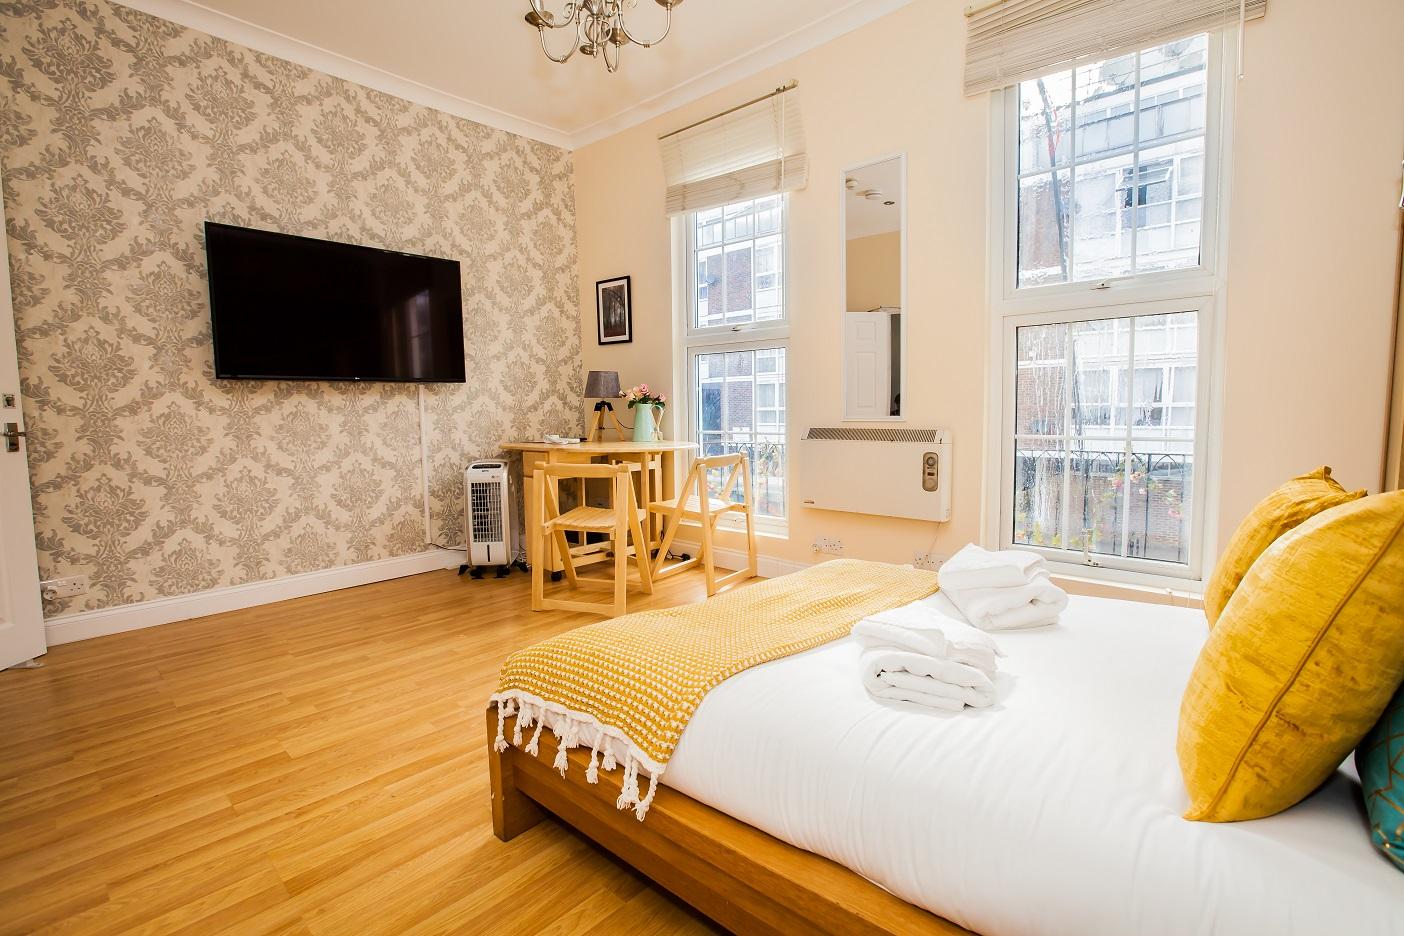 Bed at Marylebone Serviced Apartments, Marylebone, London - Citybase Apartments